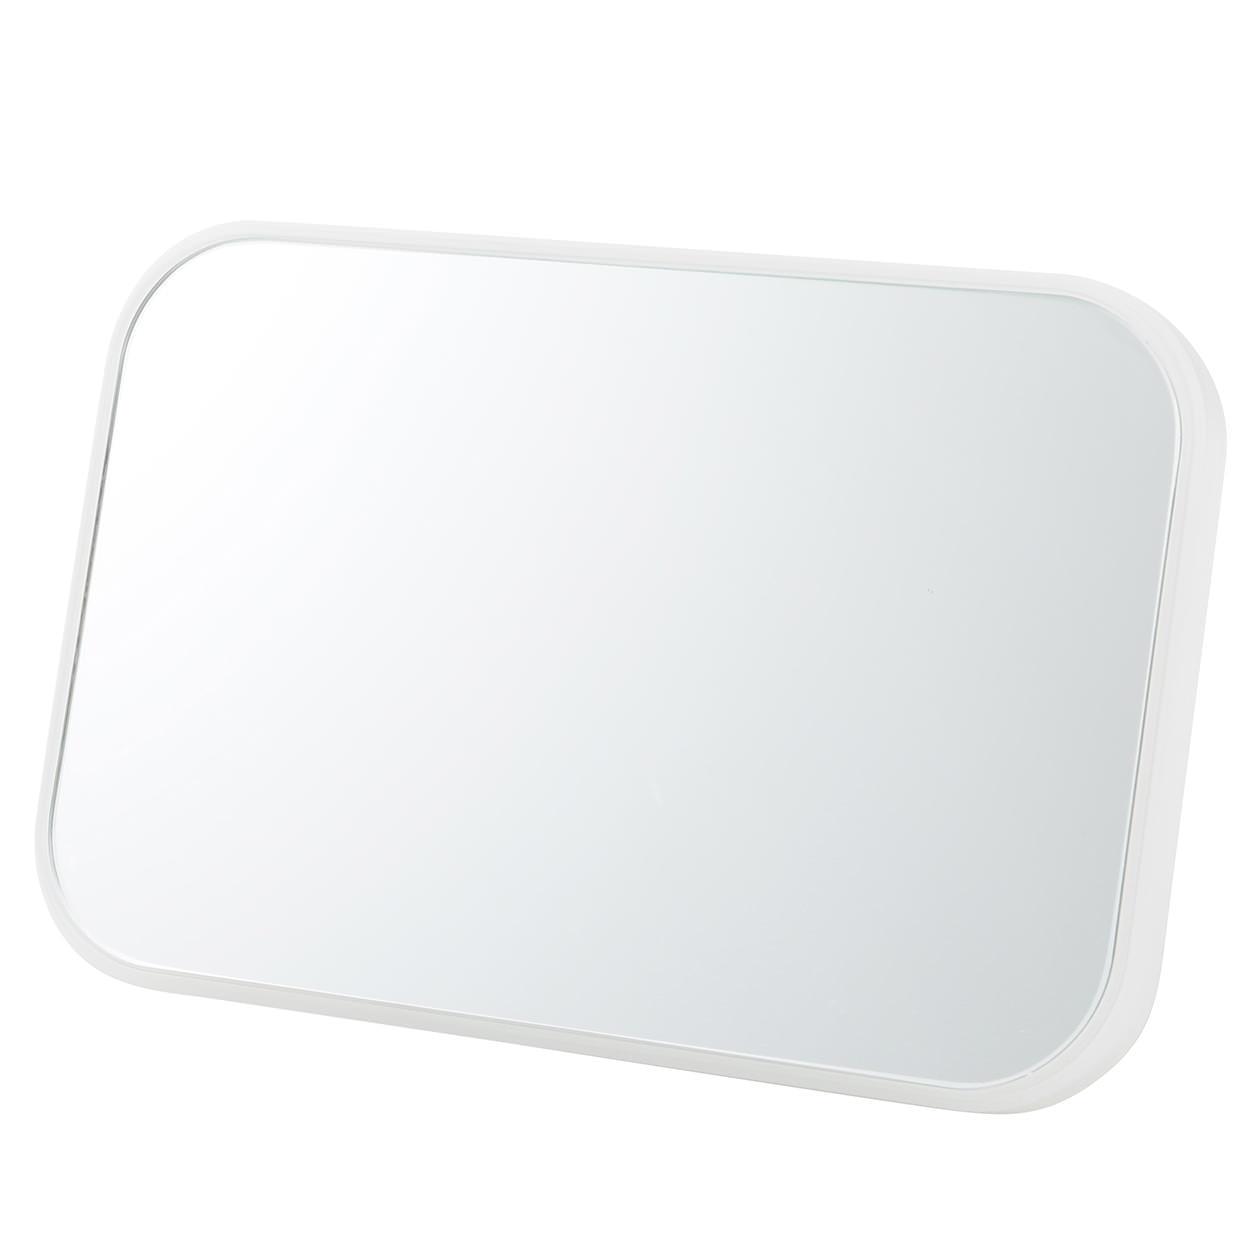 PP mirror